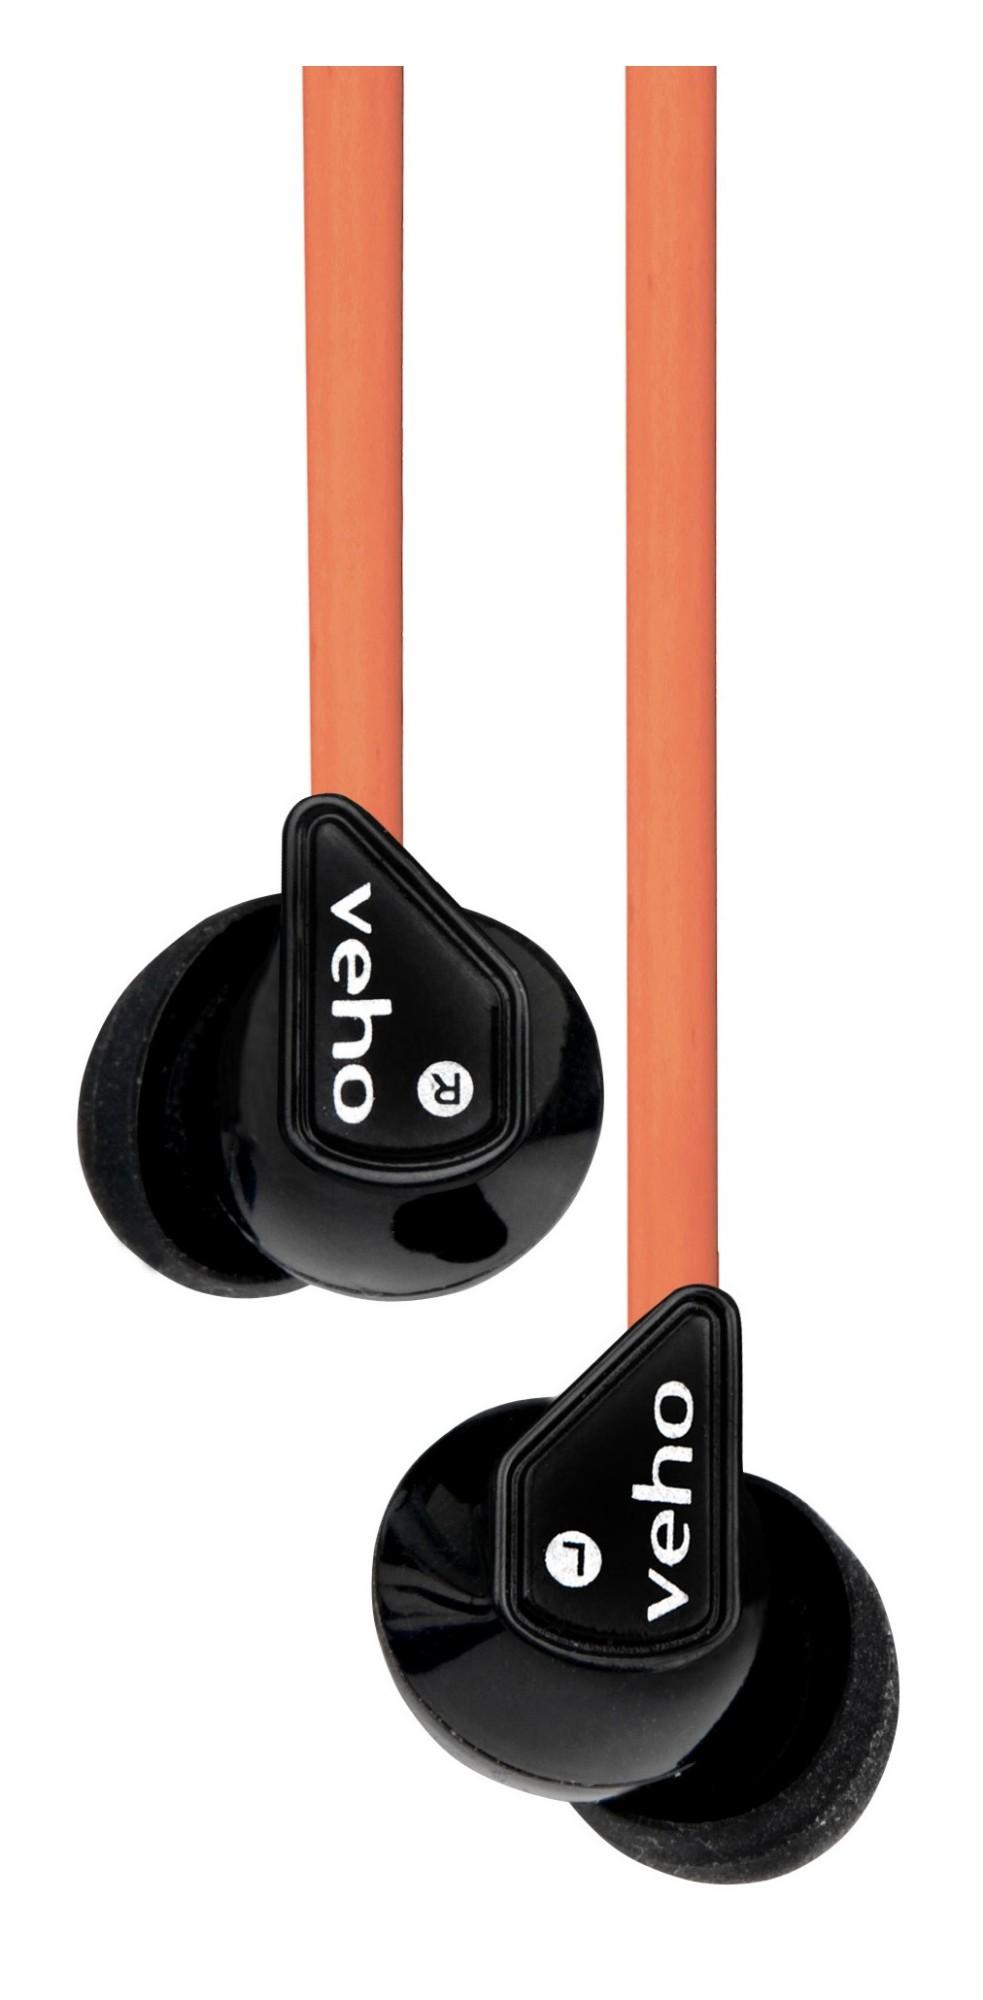 Veho Z-1 Black, Orange Intraaural In-ear headphone